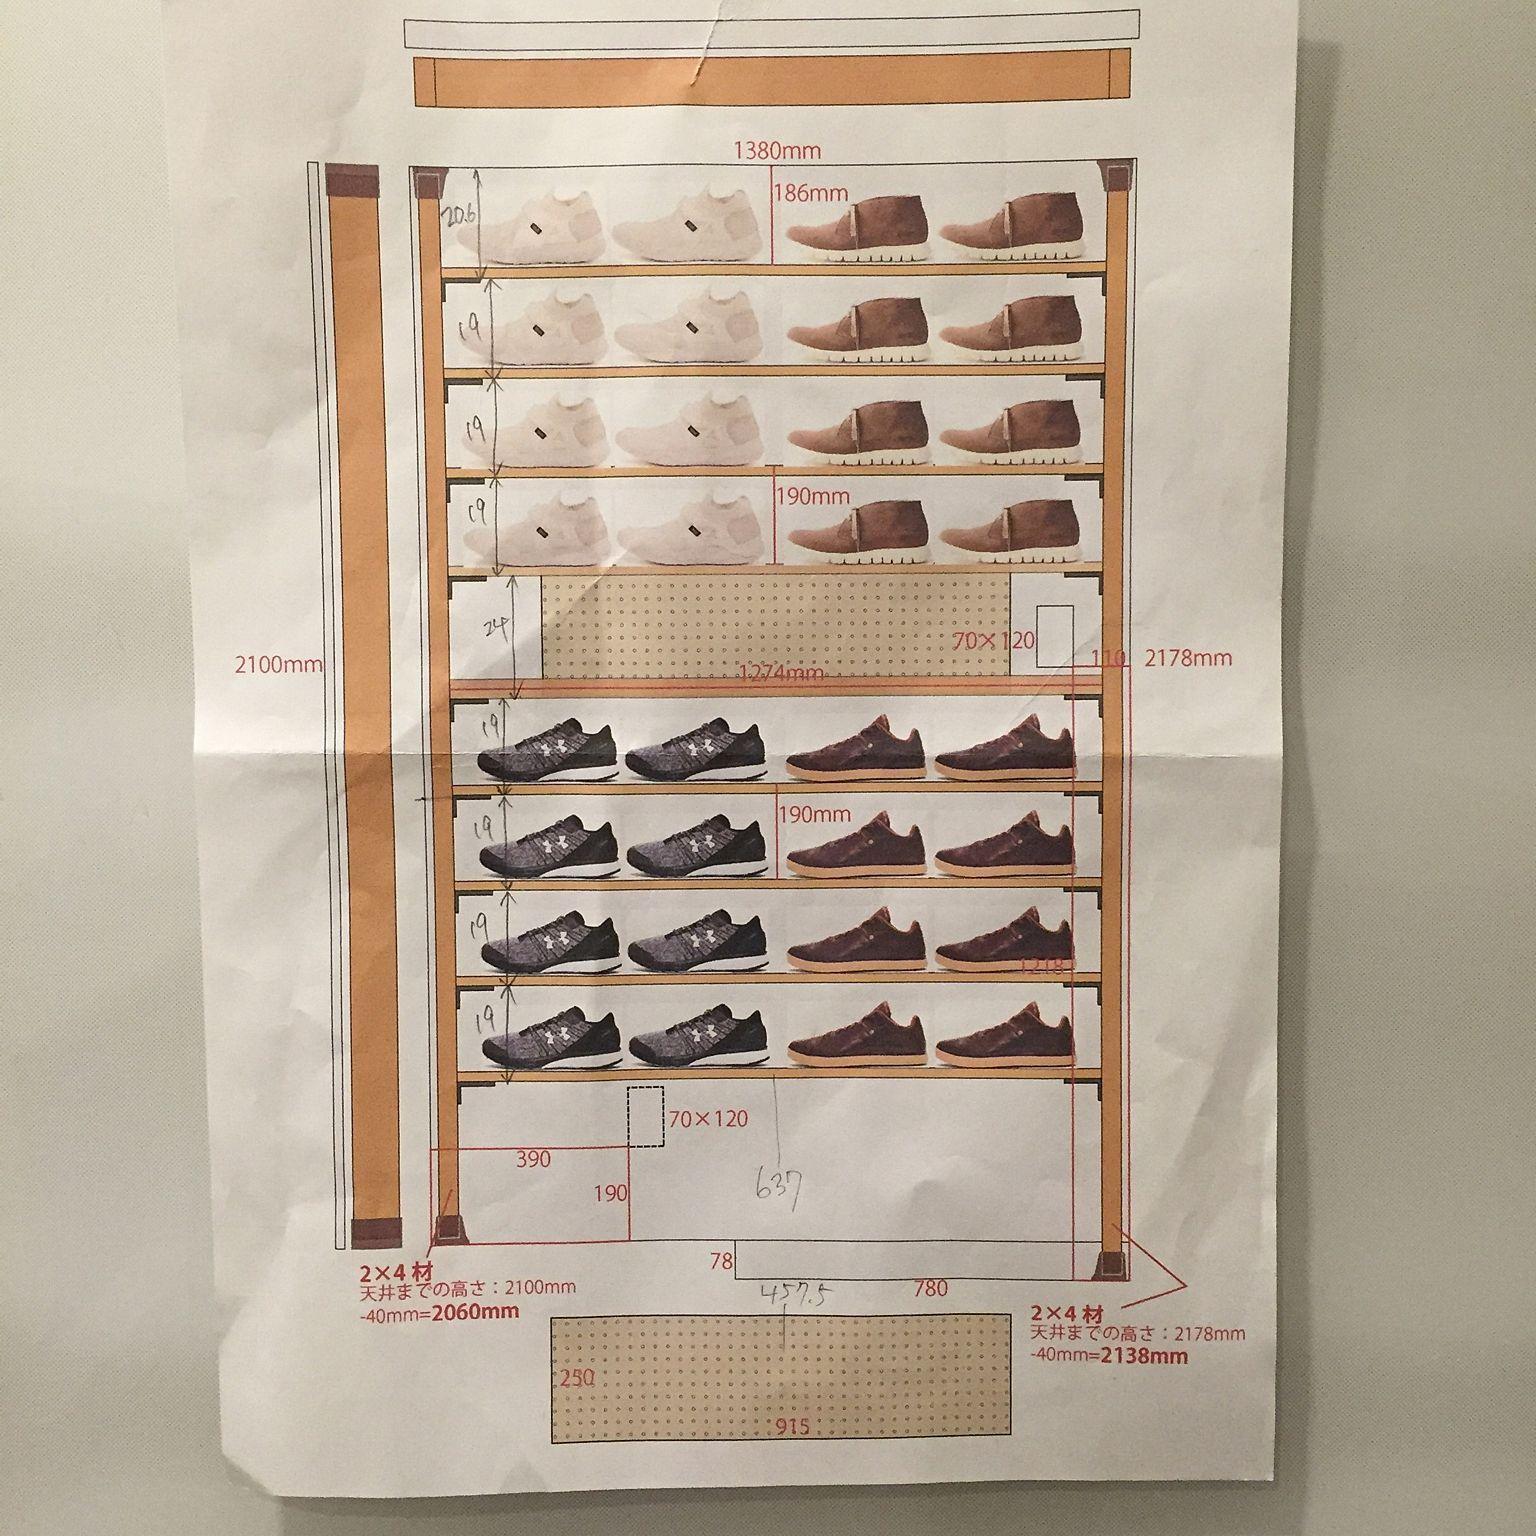 b889a467e5 玄関/入り口/DIY/シューズラック/ディアウォール/設計図/靴...などの ...